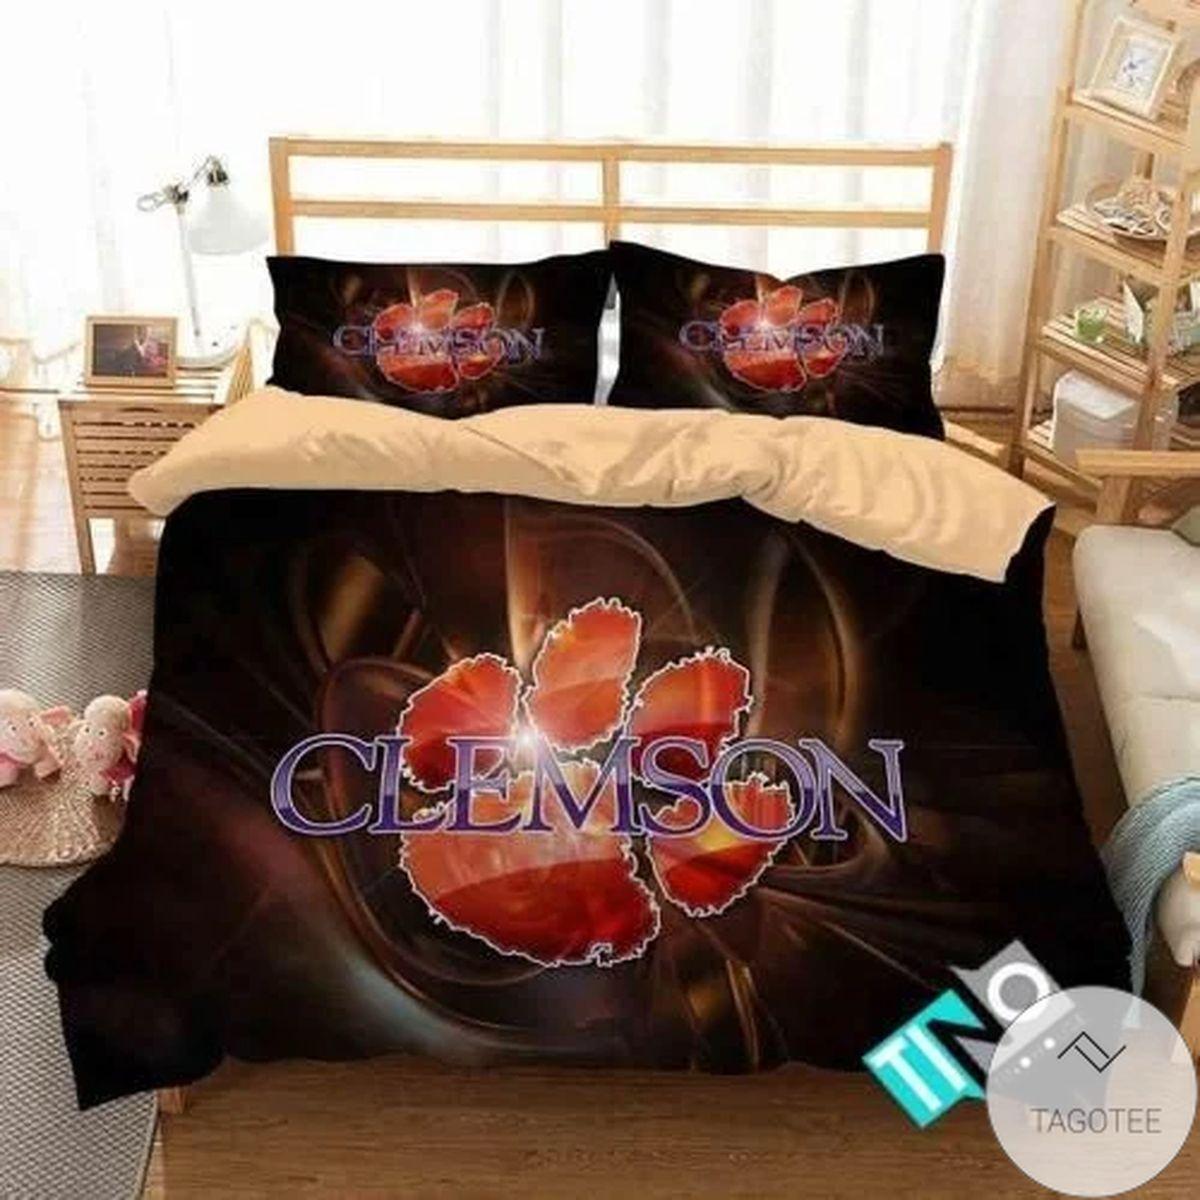 Ncaa Clemson Tigers Bedding Set